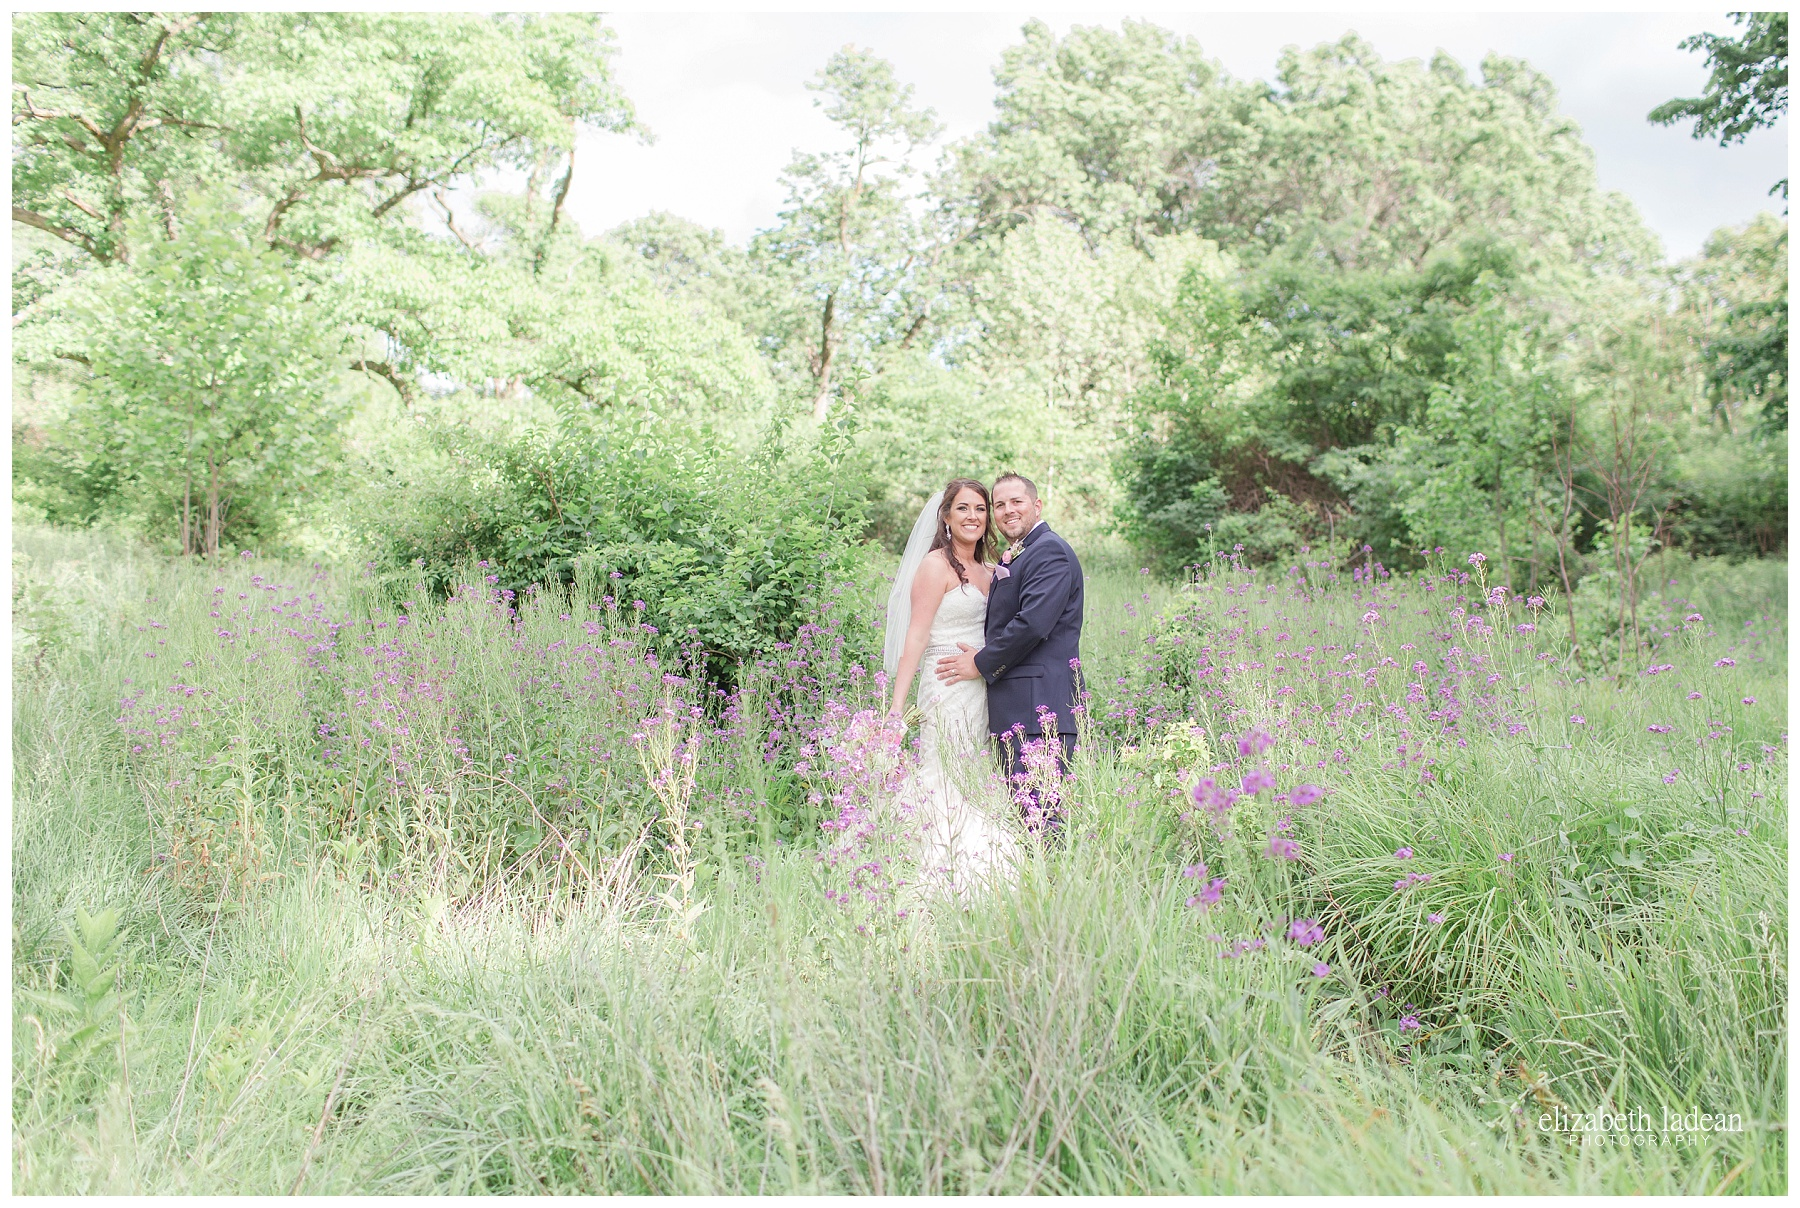 Hillcrest-Country-Club-Kansas-City-Wedding-Photography-E+J-0520-Elizabeth-Ladean-Photography-photo_0845.jpg